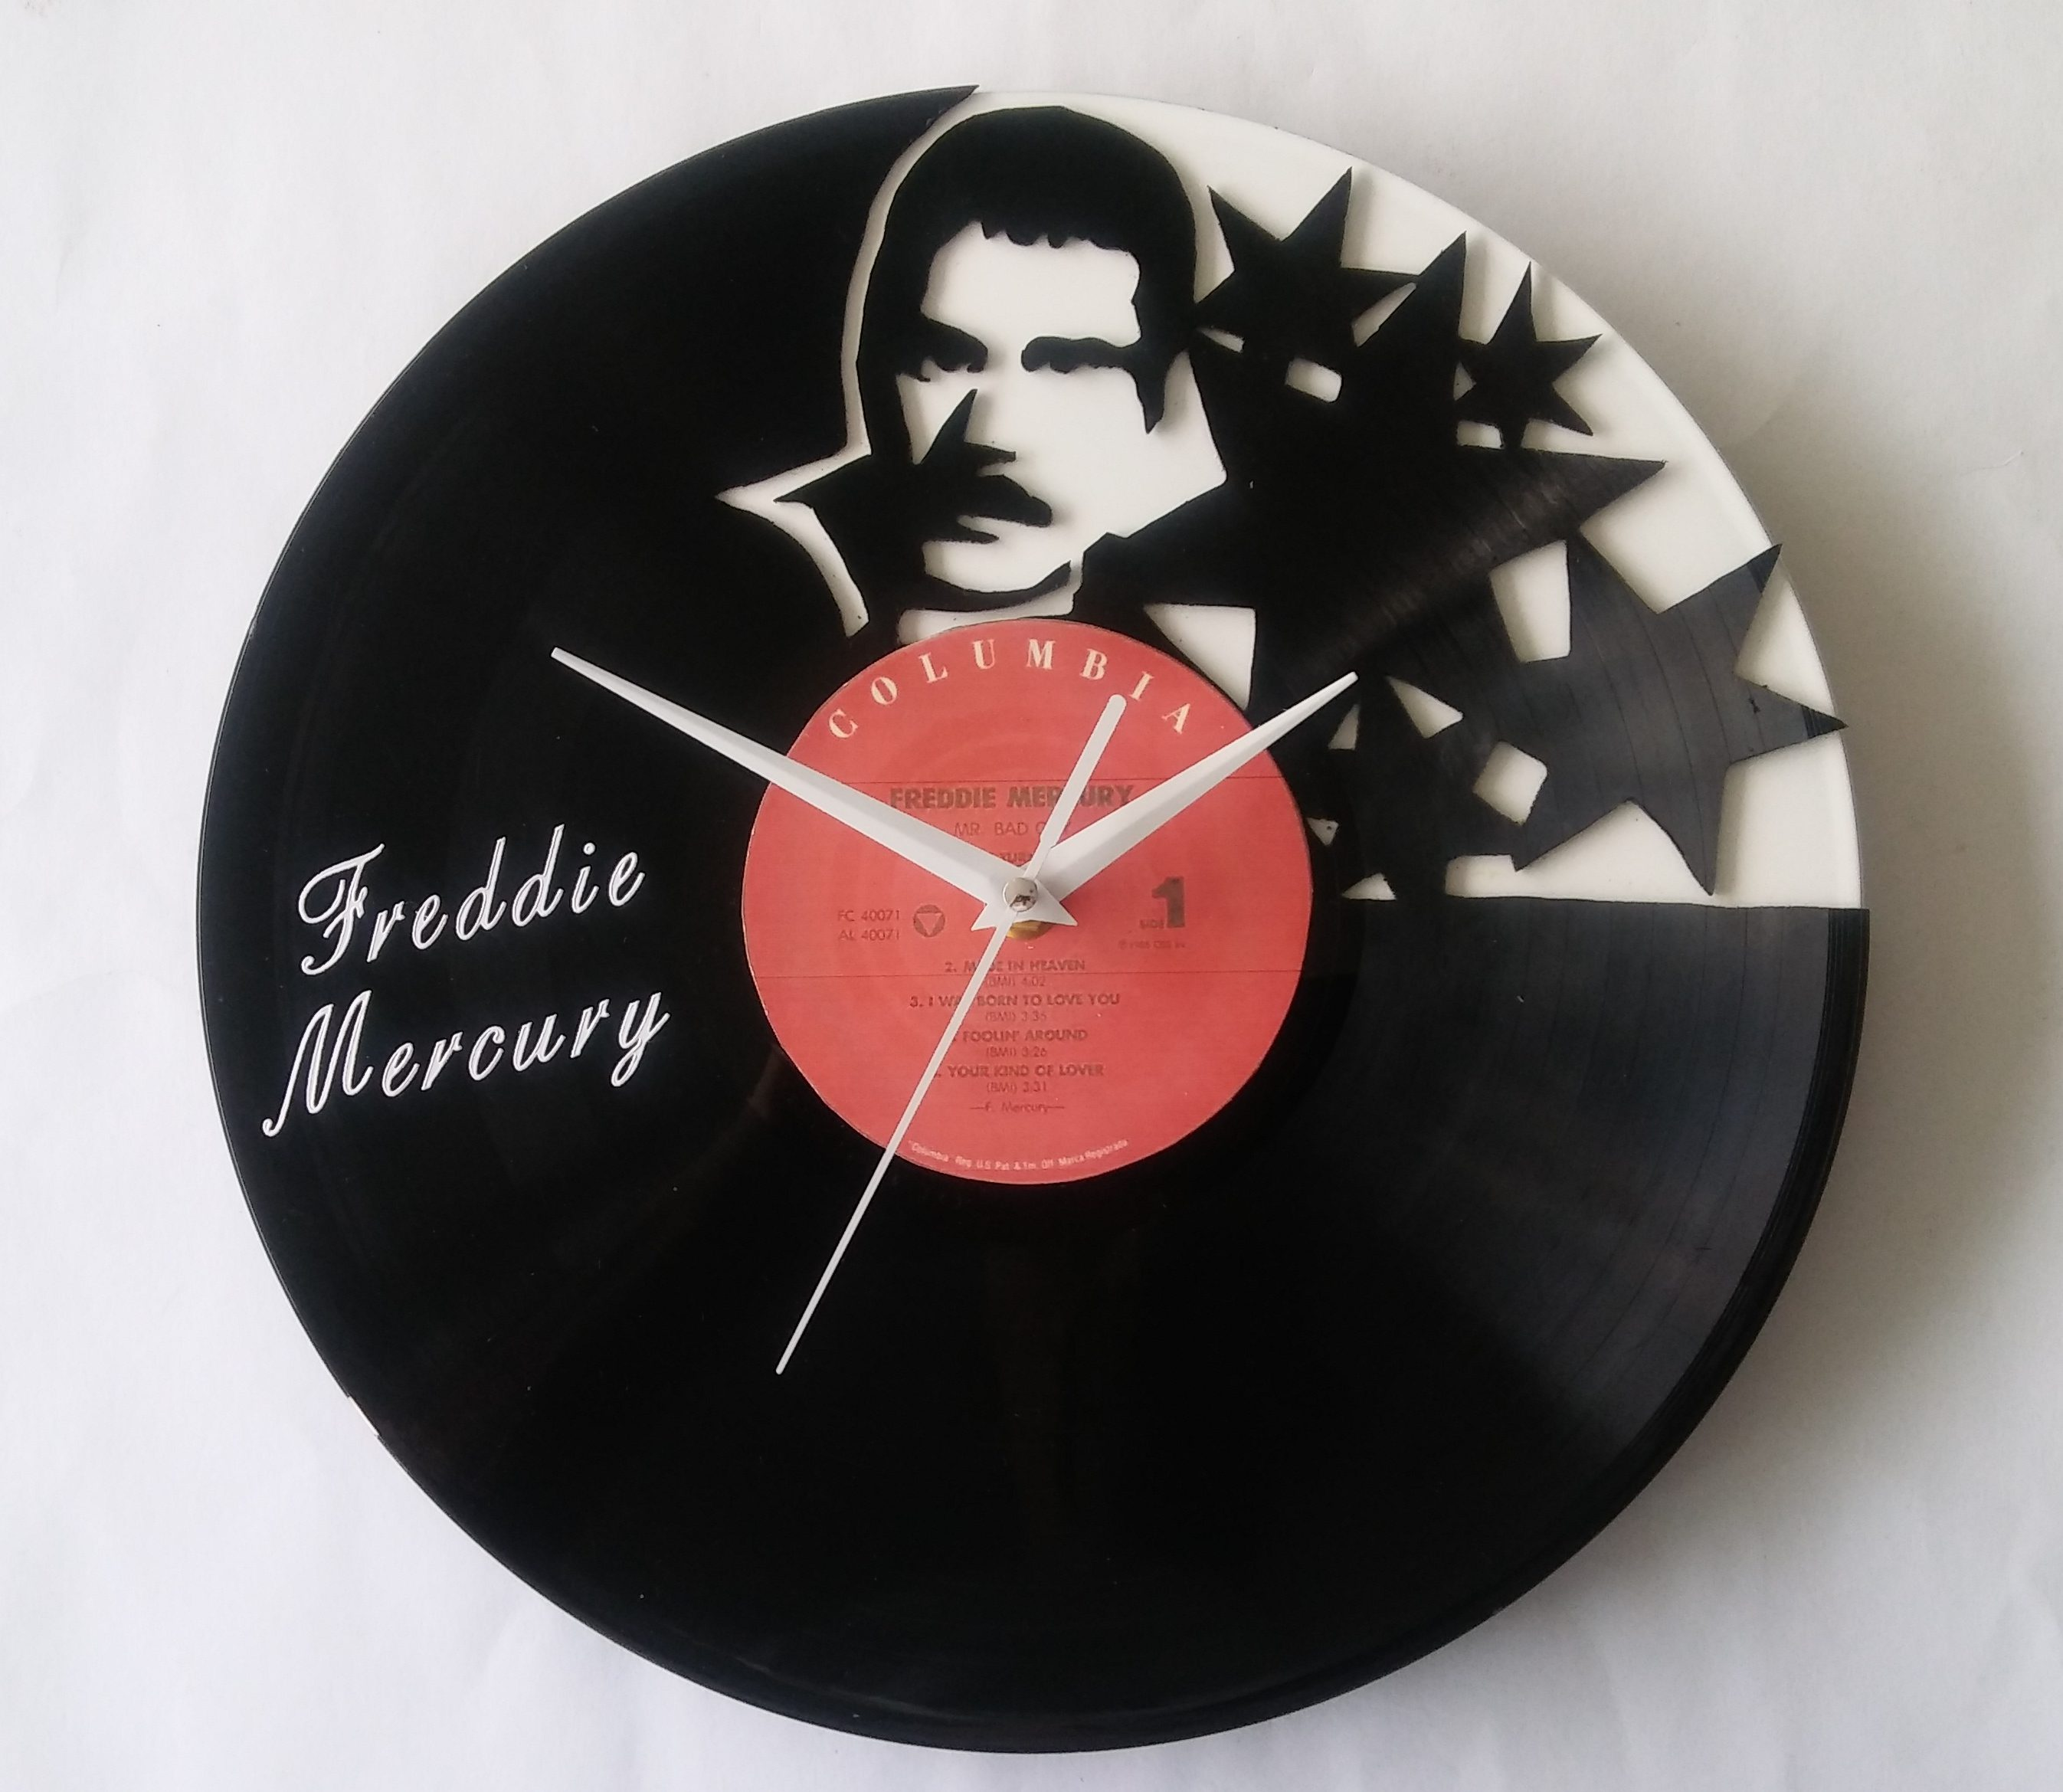 Freddie Mercury (25)